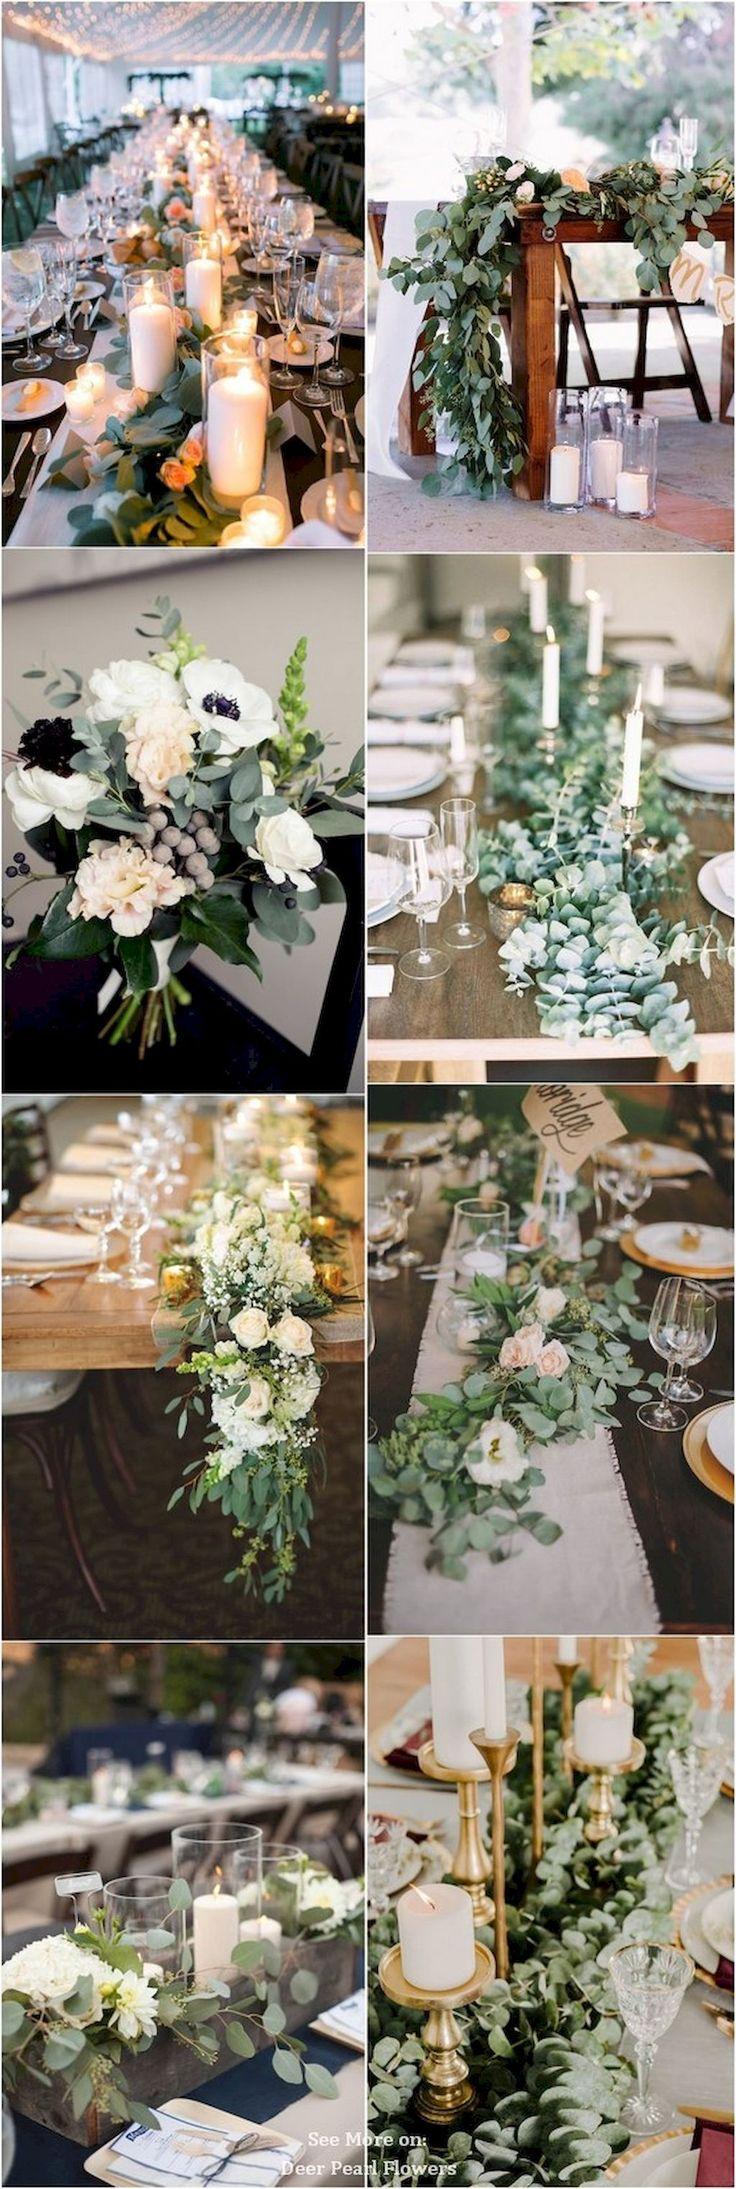 Nice 67 Simple Greenery Wedding Centerpieces Ideas https://bitecloth.com/2017/09/04/67-simple-greenery-wedding-centerpieces-ideas/